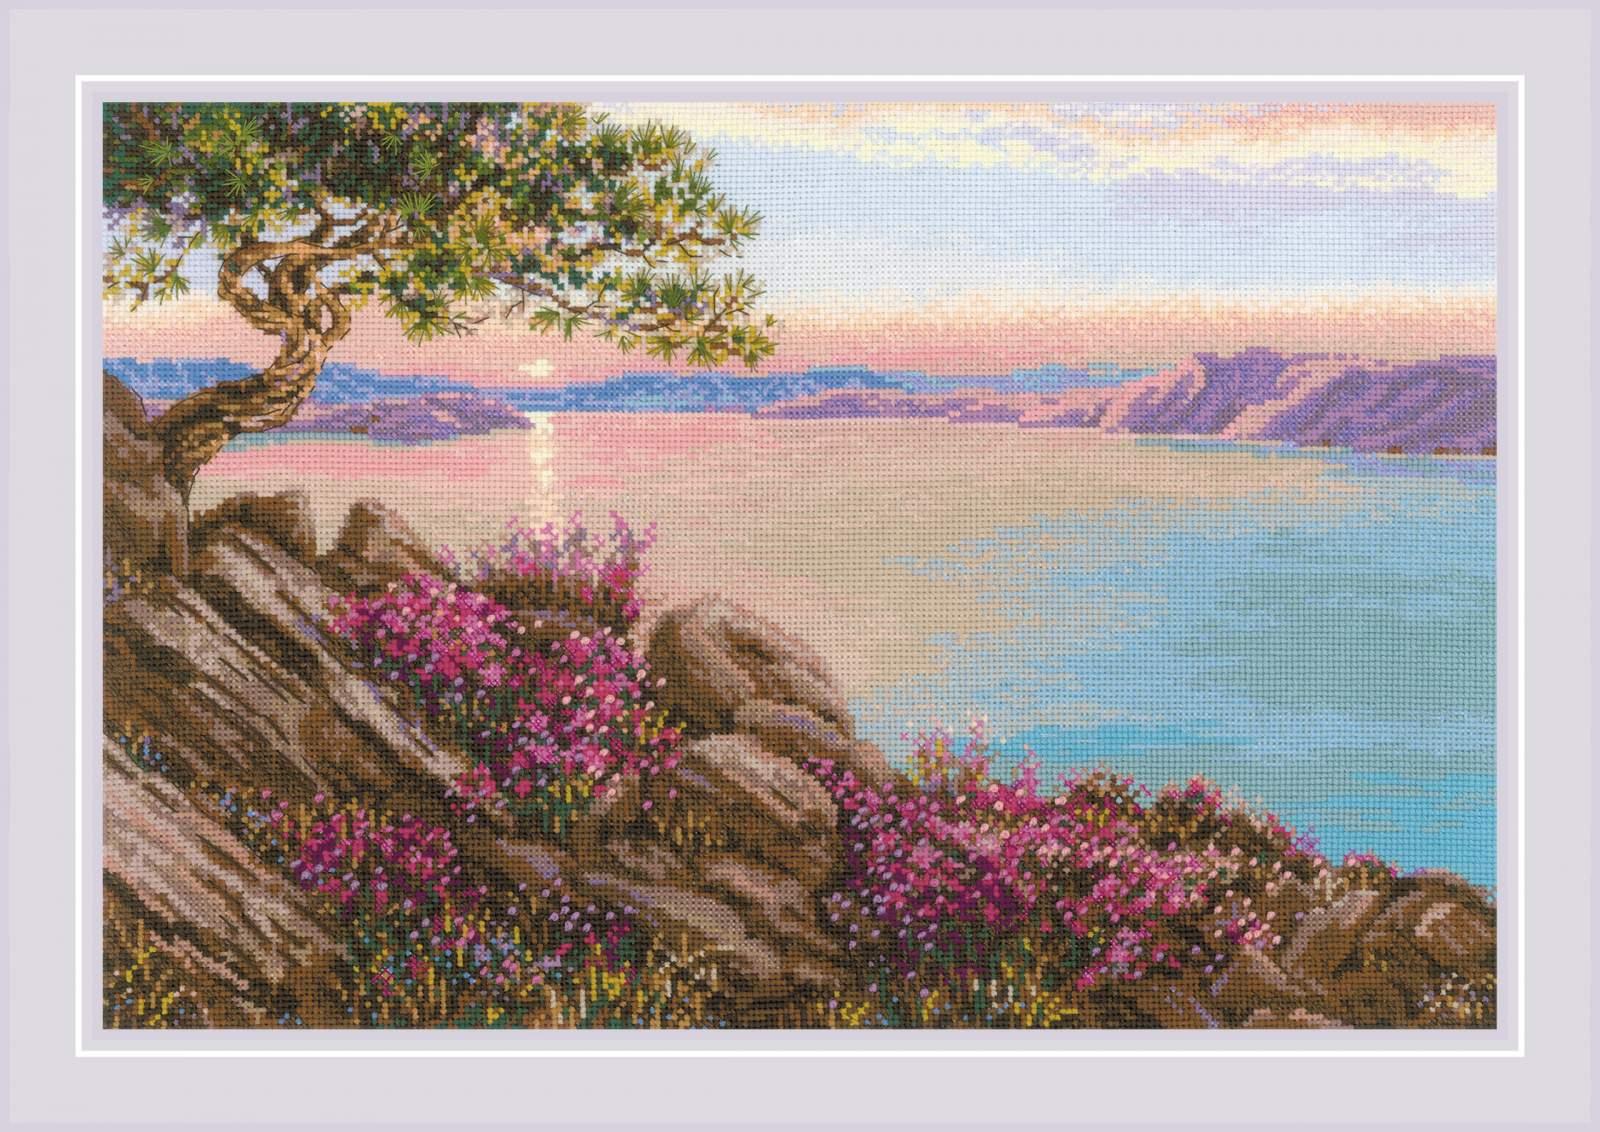 RIOLISクロスステッチ刺繍キット No.1706 「Lake Baikal」 (バイカル湖) 【海外取り寄せ/納期30~60日程度】